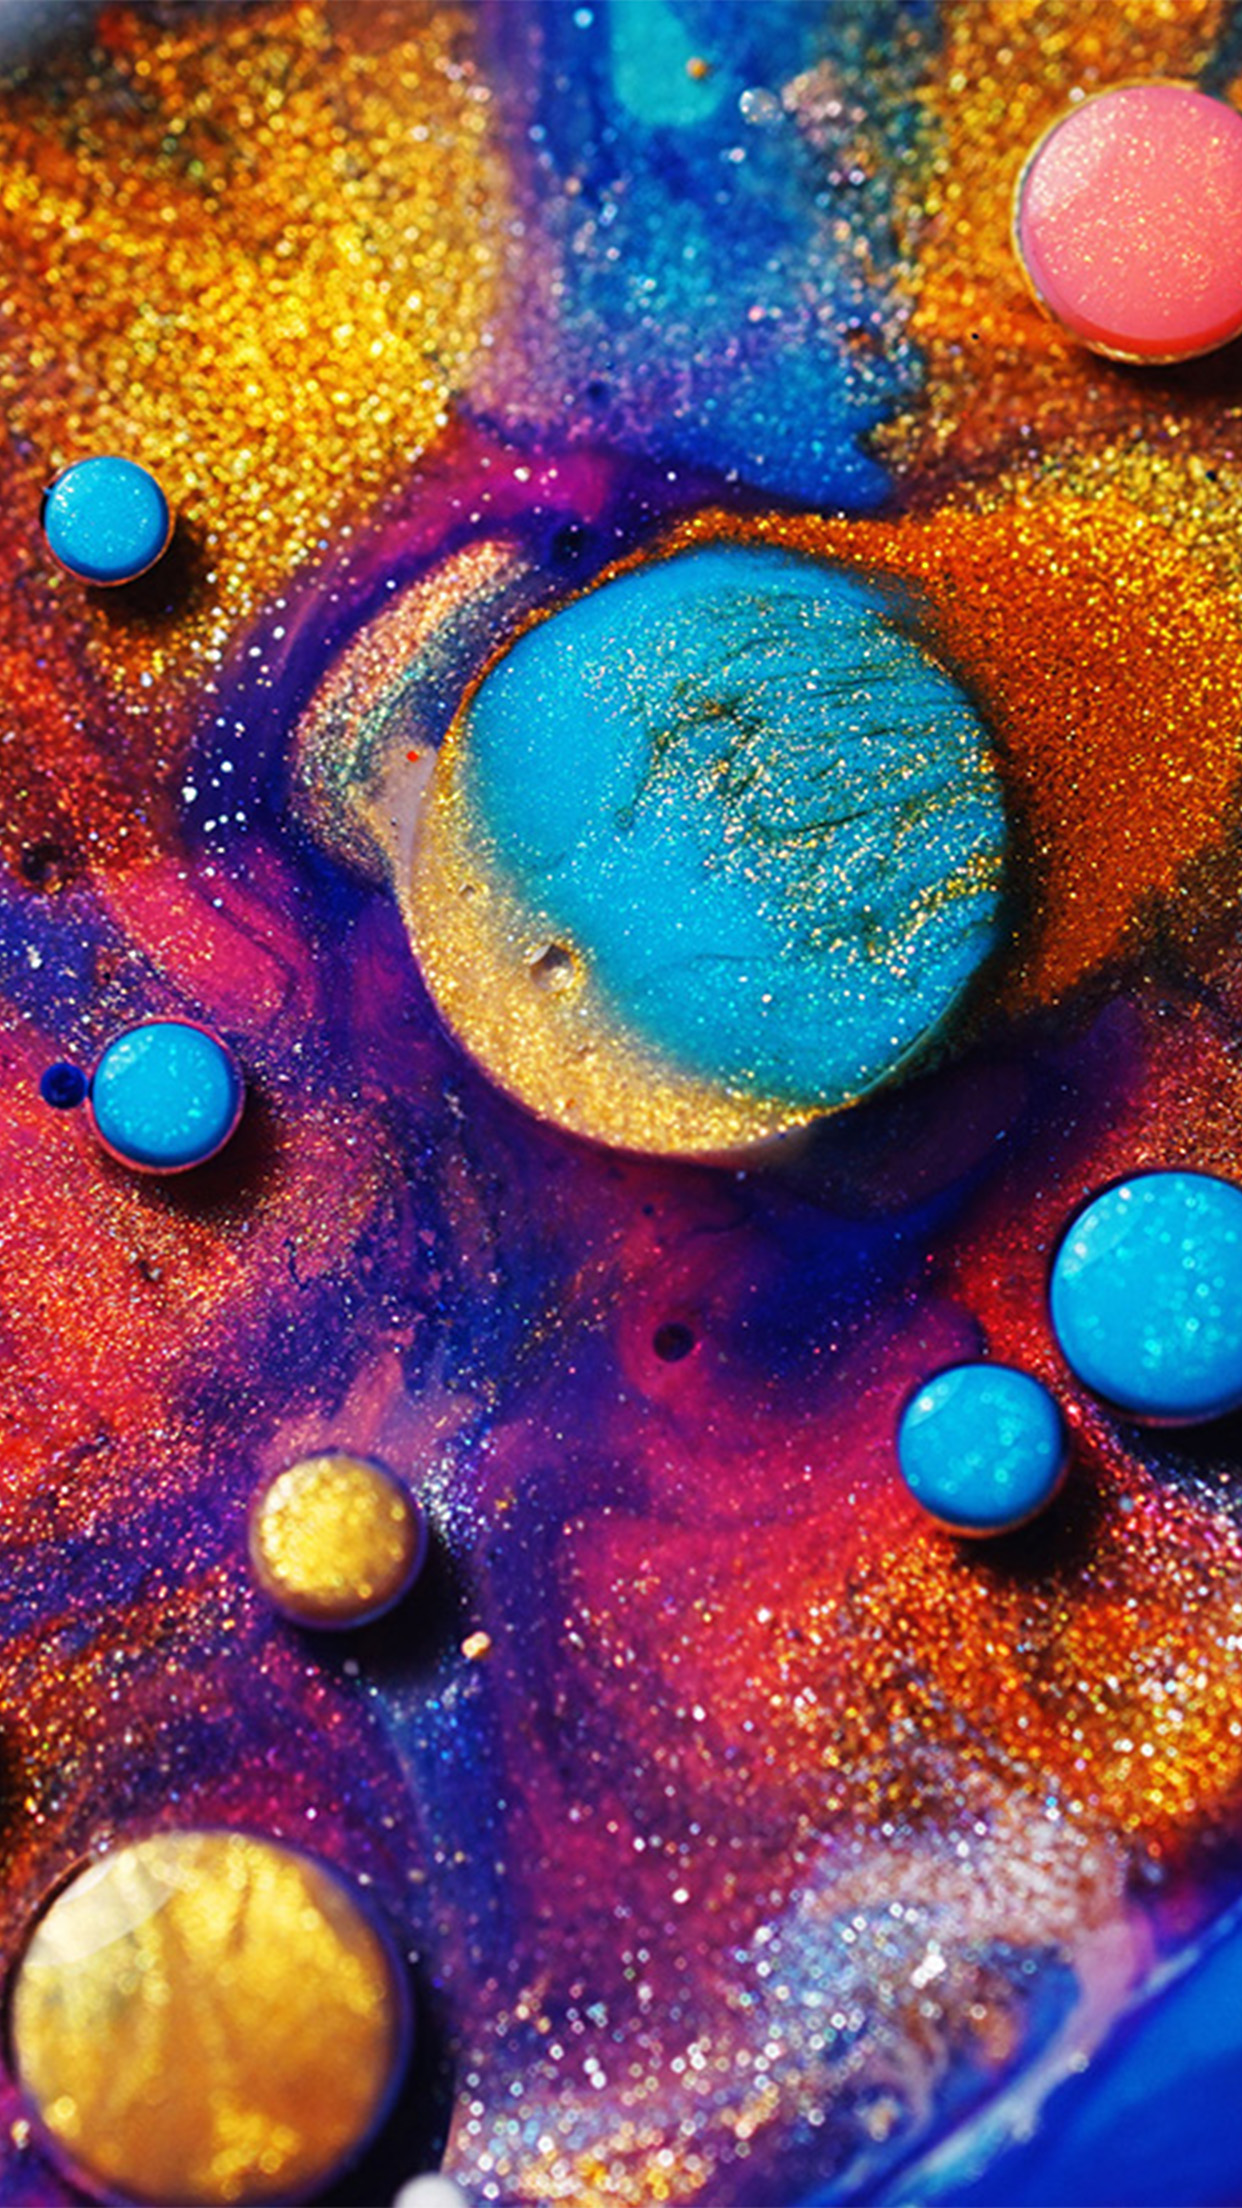 Makeup Wallpaper: Vz15-makeup-color-art-pattern-background-wallpaper